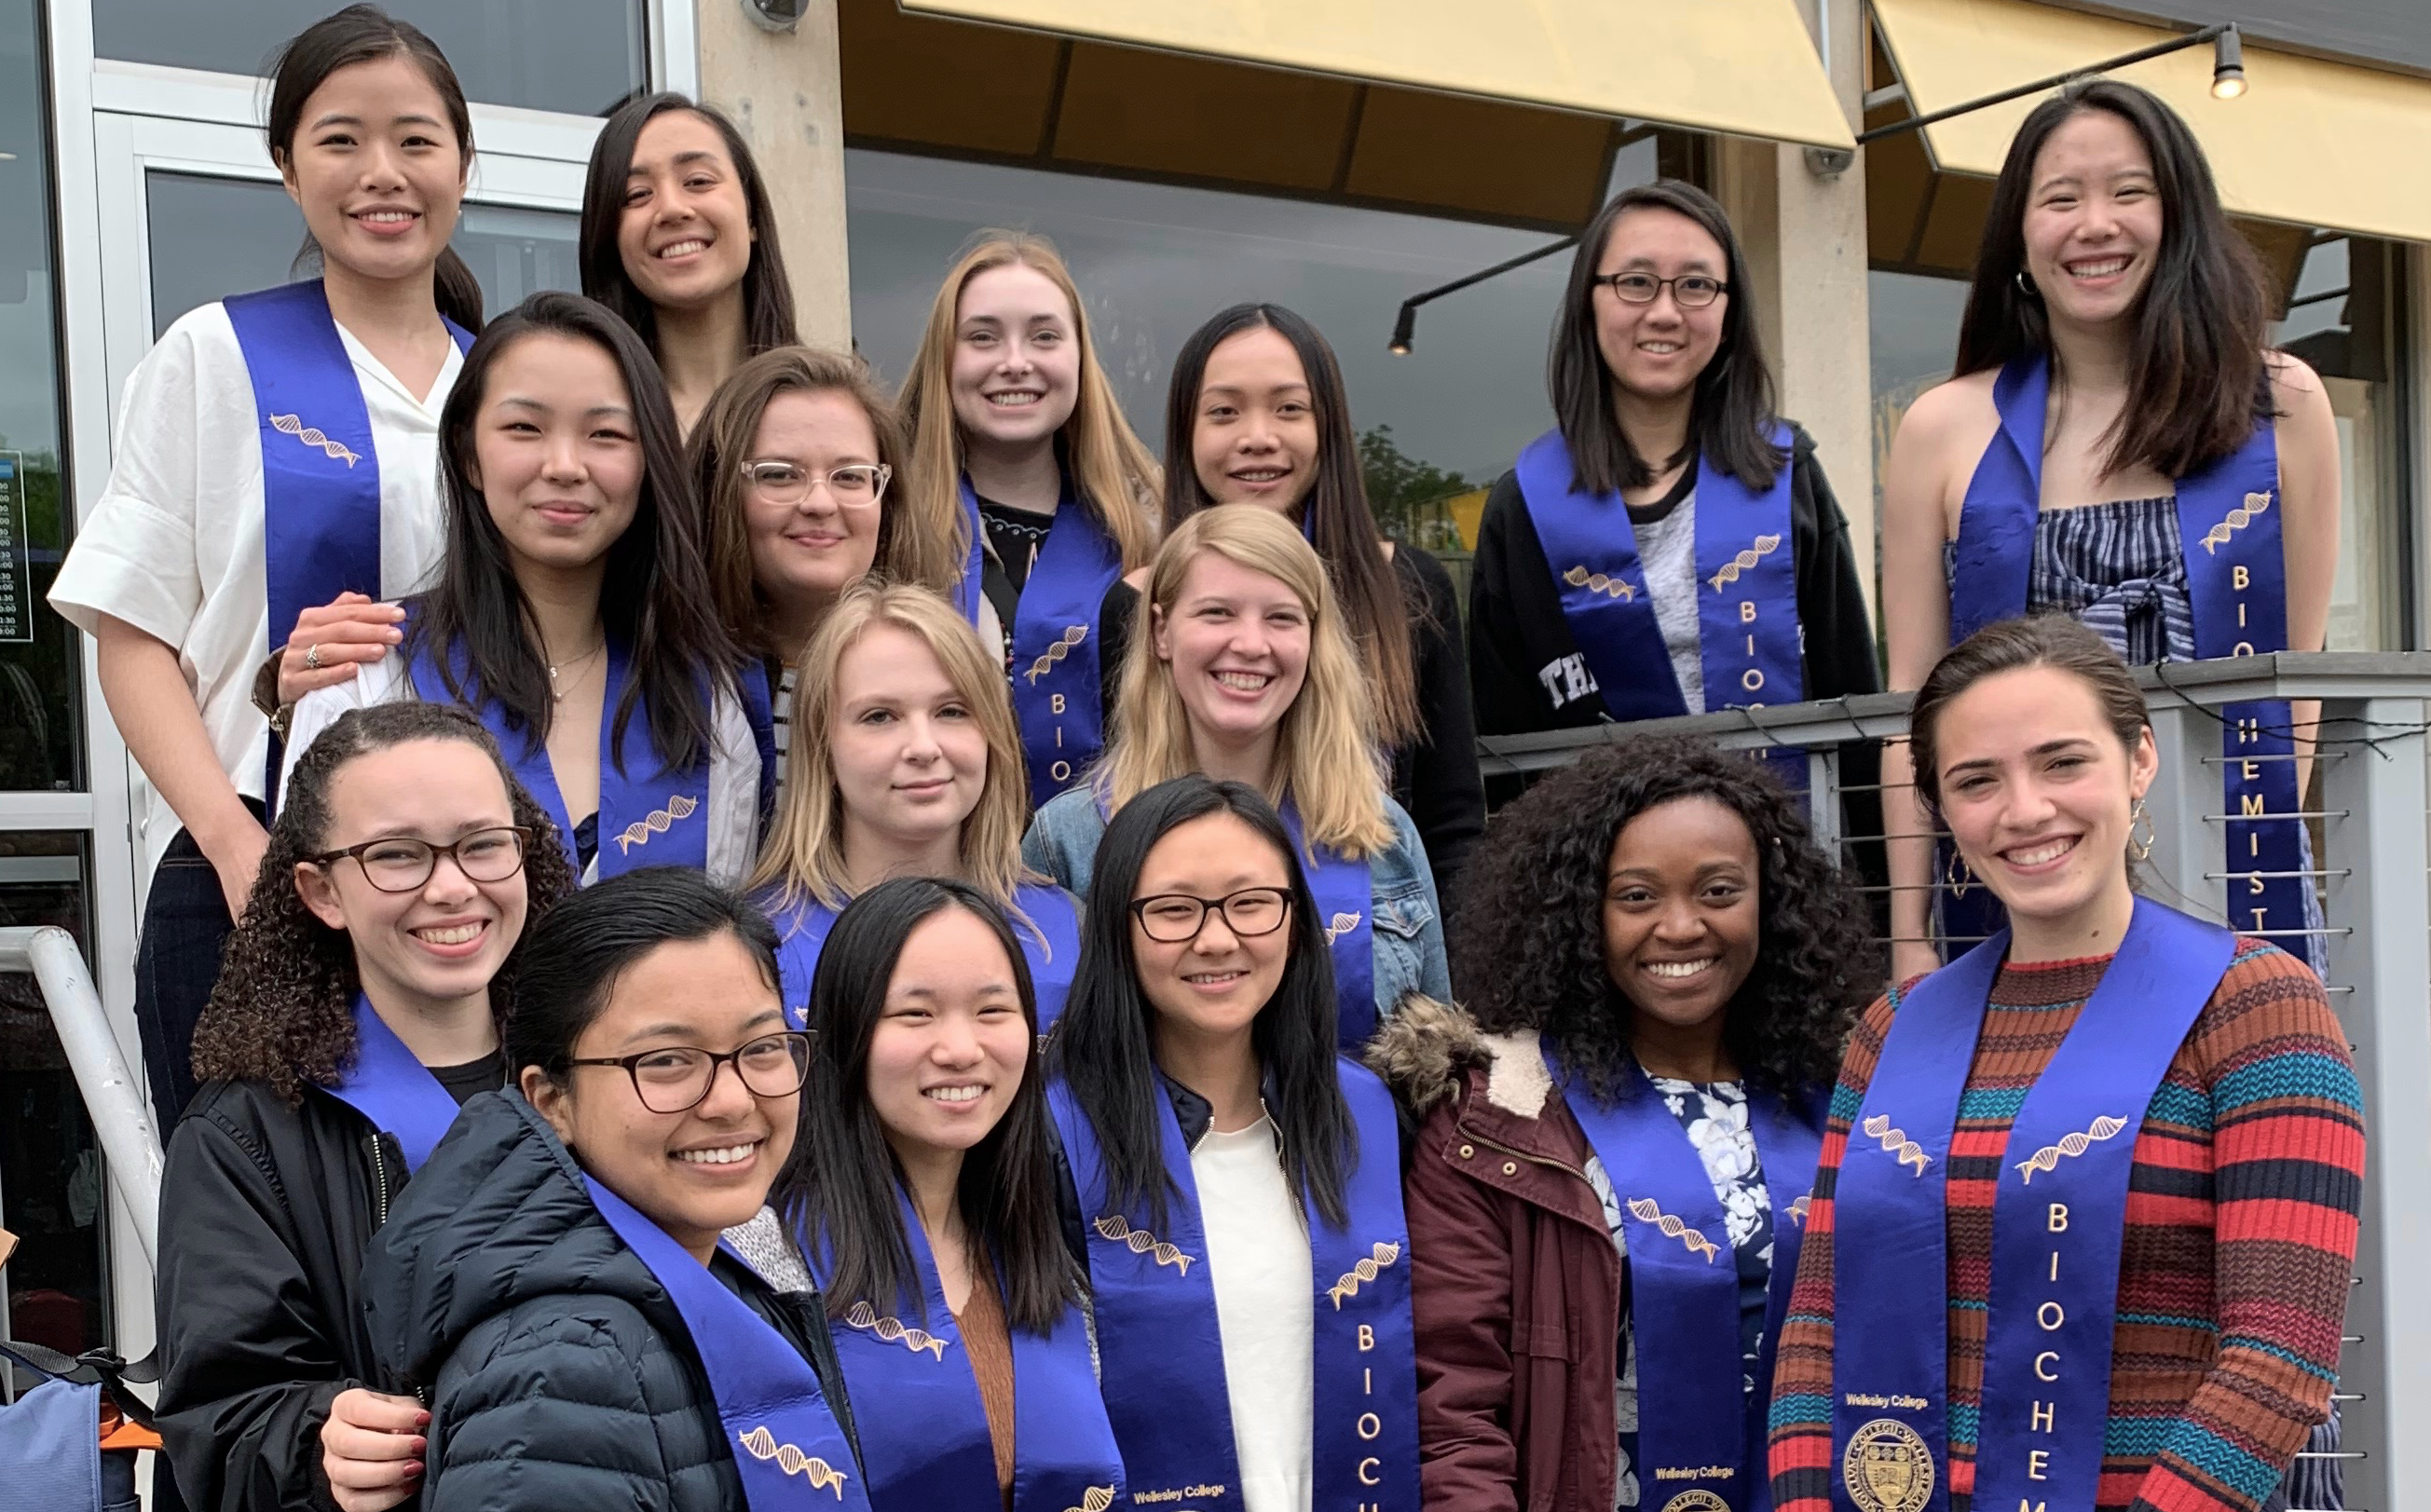 2019 Biochemistry Graduates